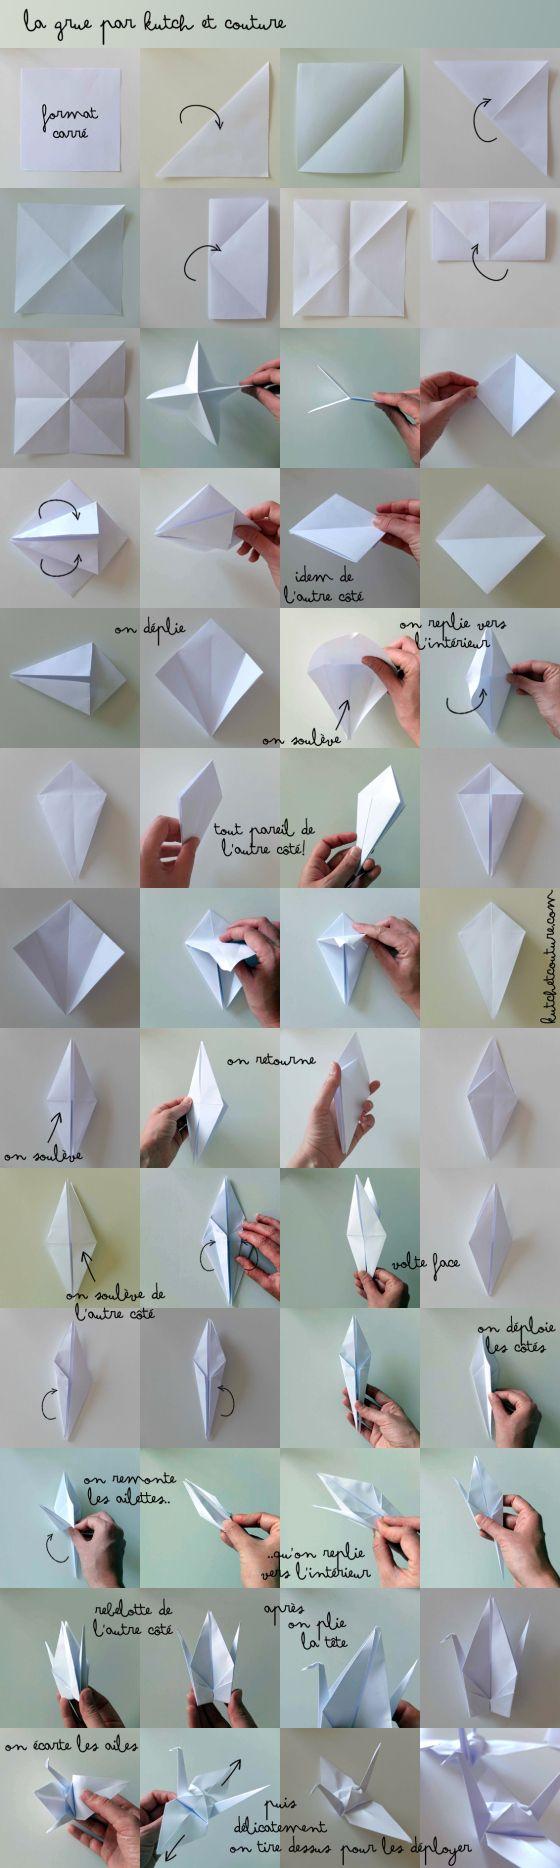 kranich papierecycling origami origami kranich et. Black Bedroom Furniture Sets. Home Design Ideas